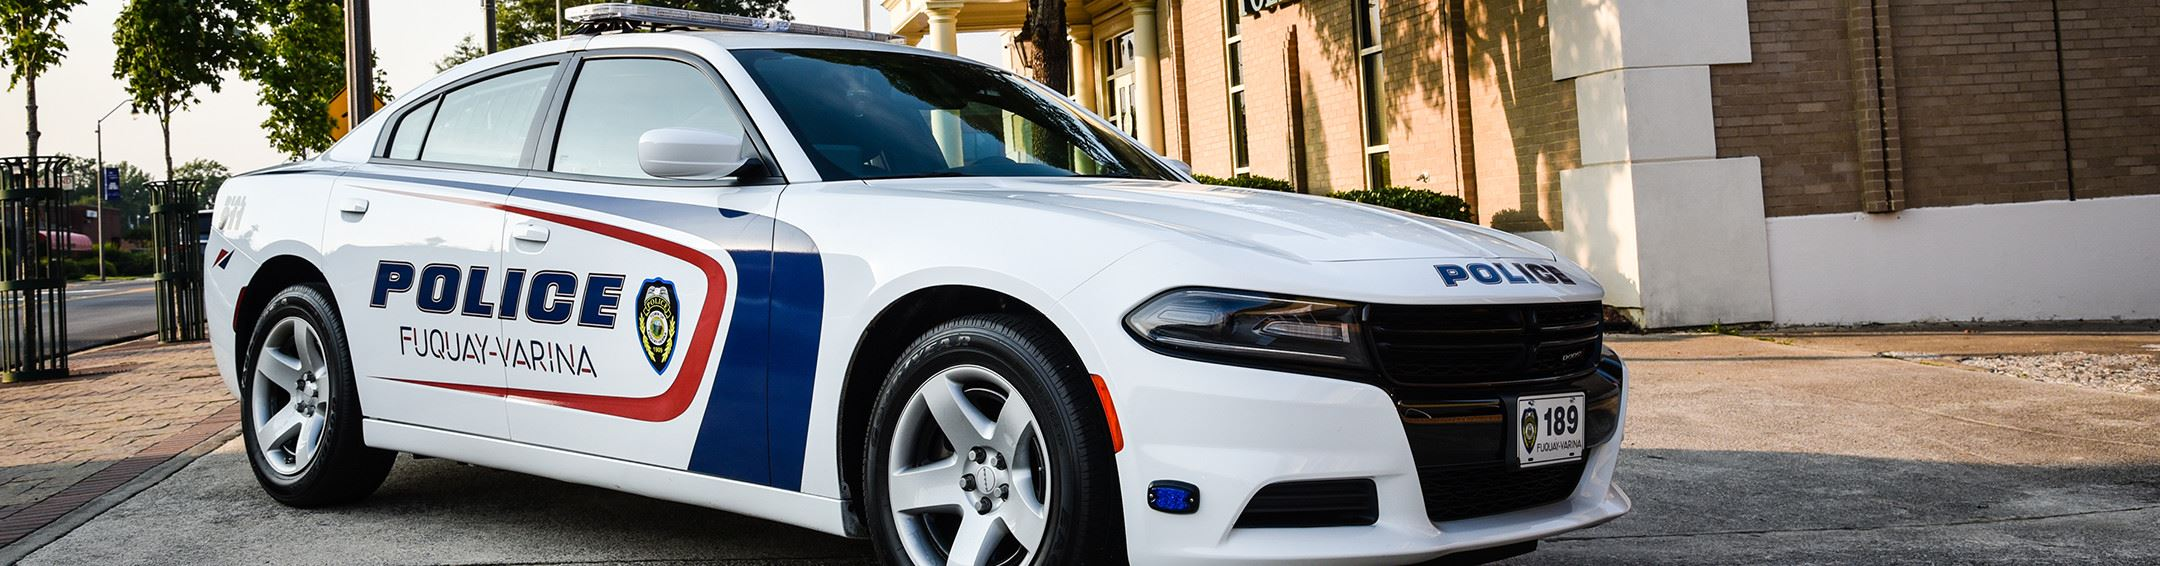 Police Department | Fuquay-Varina, NC